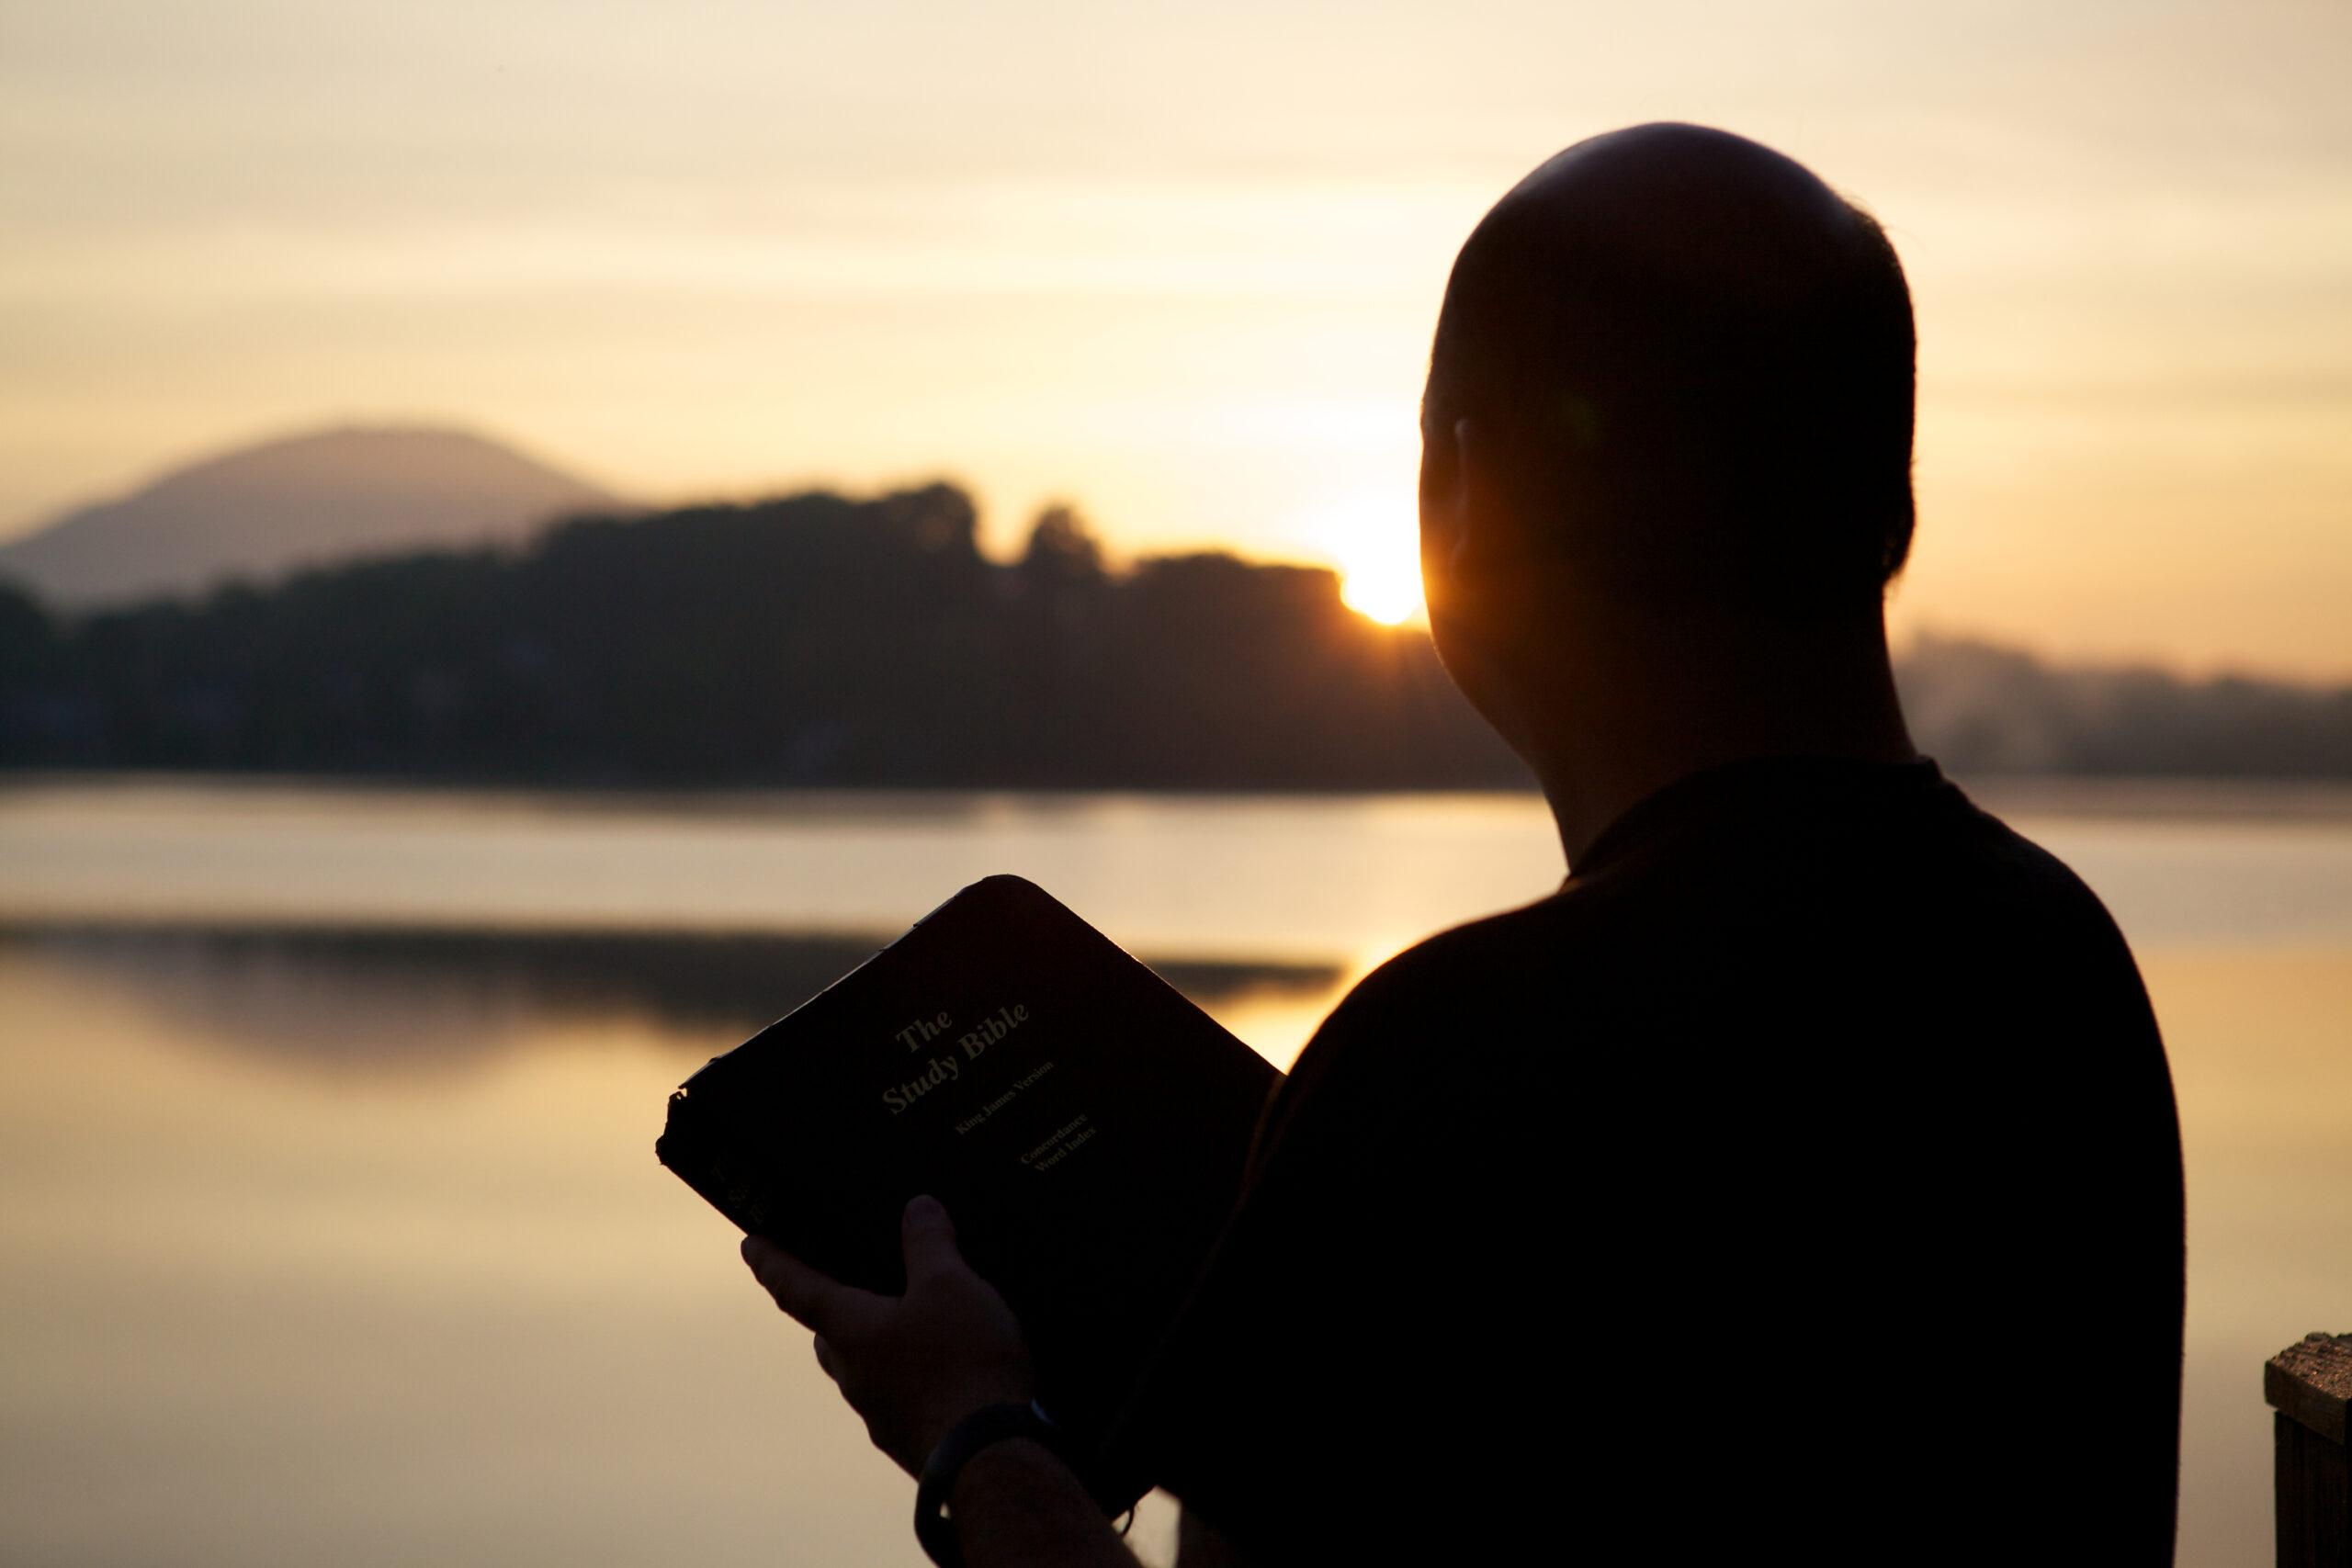 Men's Fellowship - From the Heart Church Ministries of Harrisburg